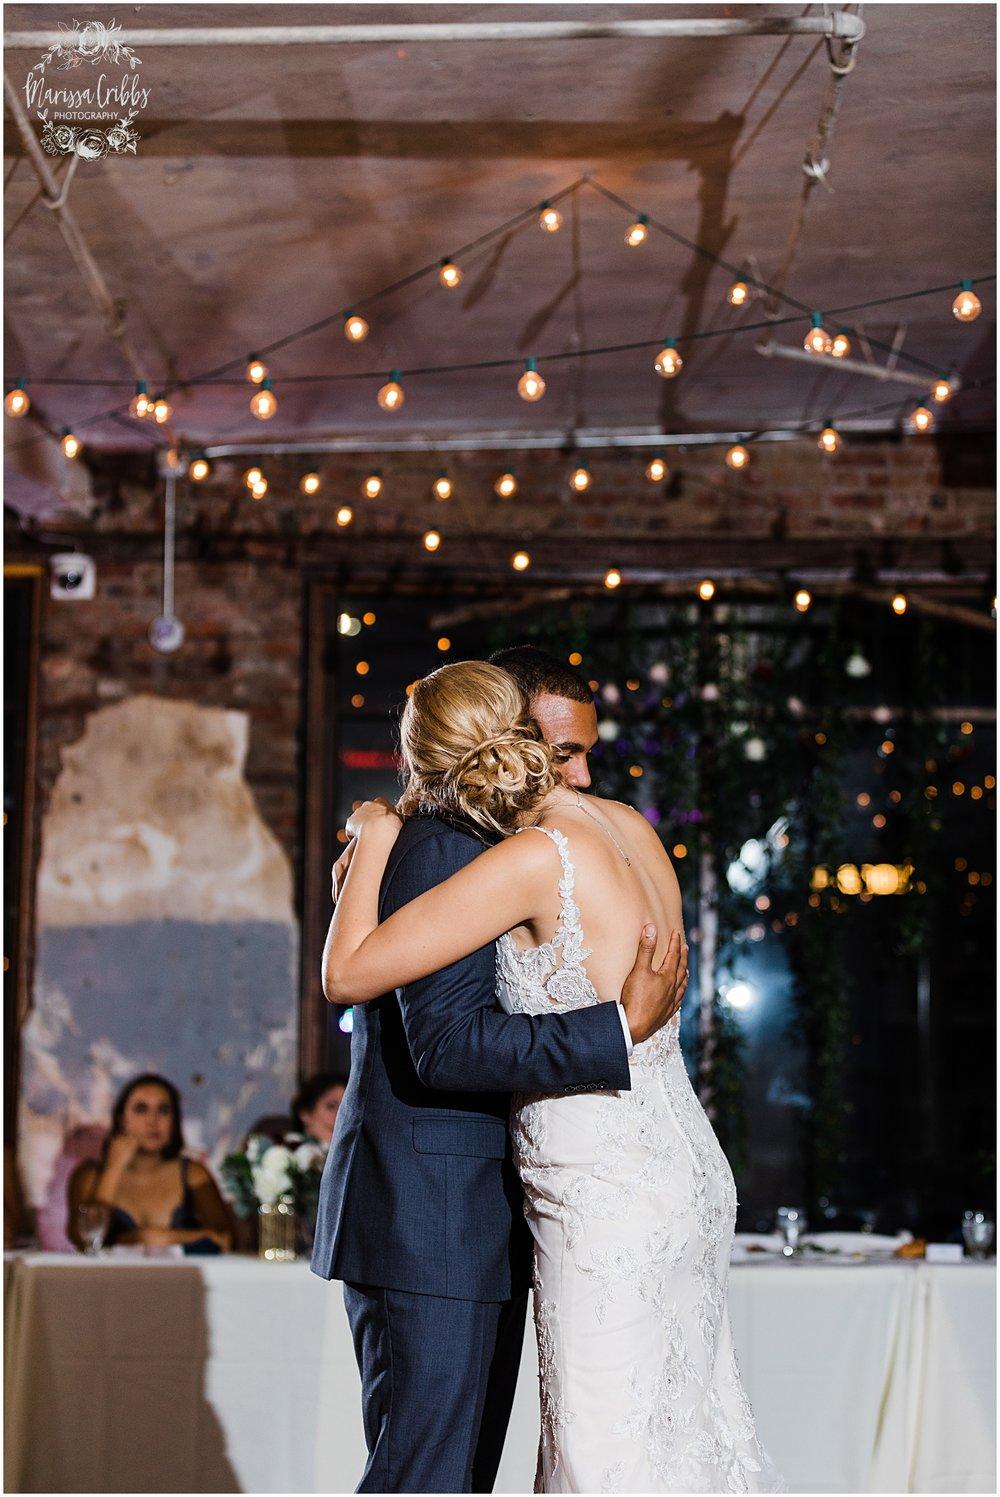 BAUER WEDDING   KELSEA & JUSTIN   MARISSA CRIBBS PHOTOGRAPHY_6596.jpg